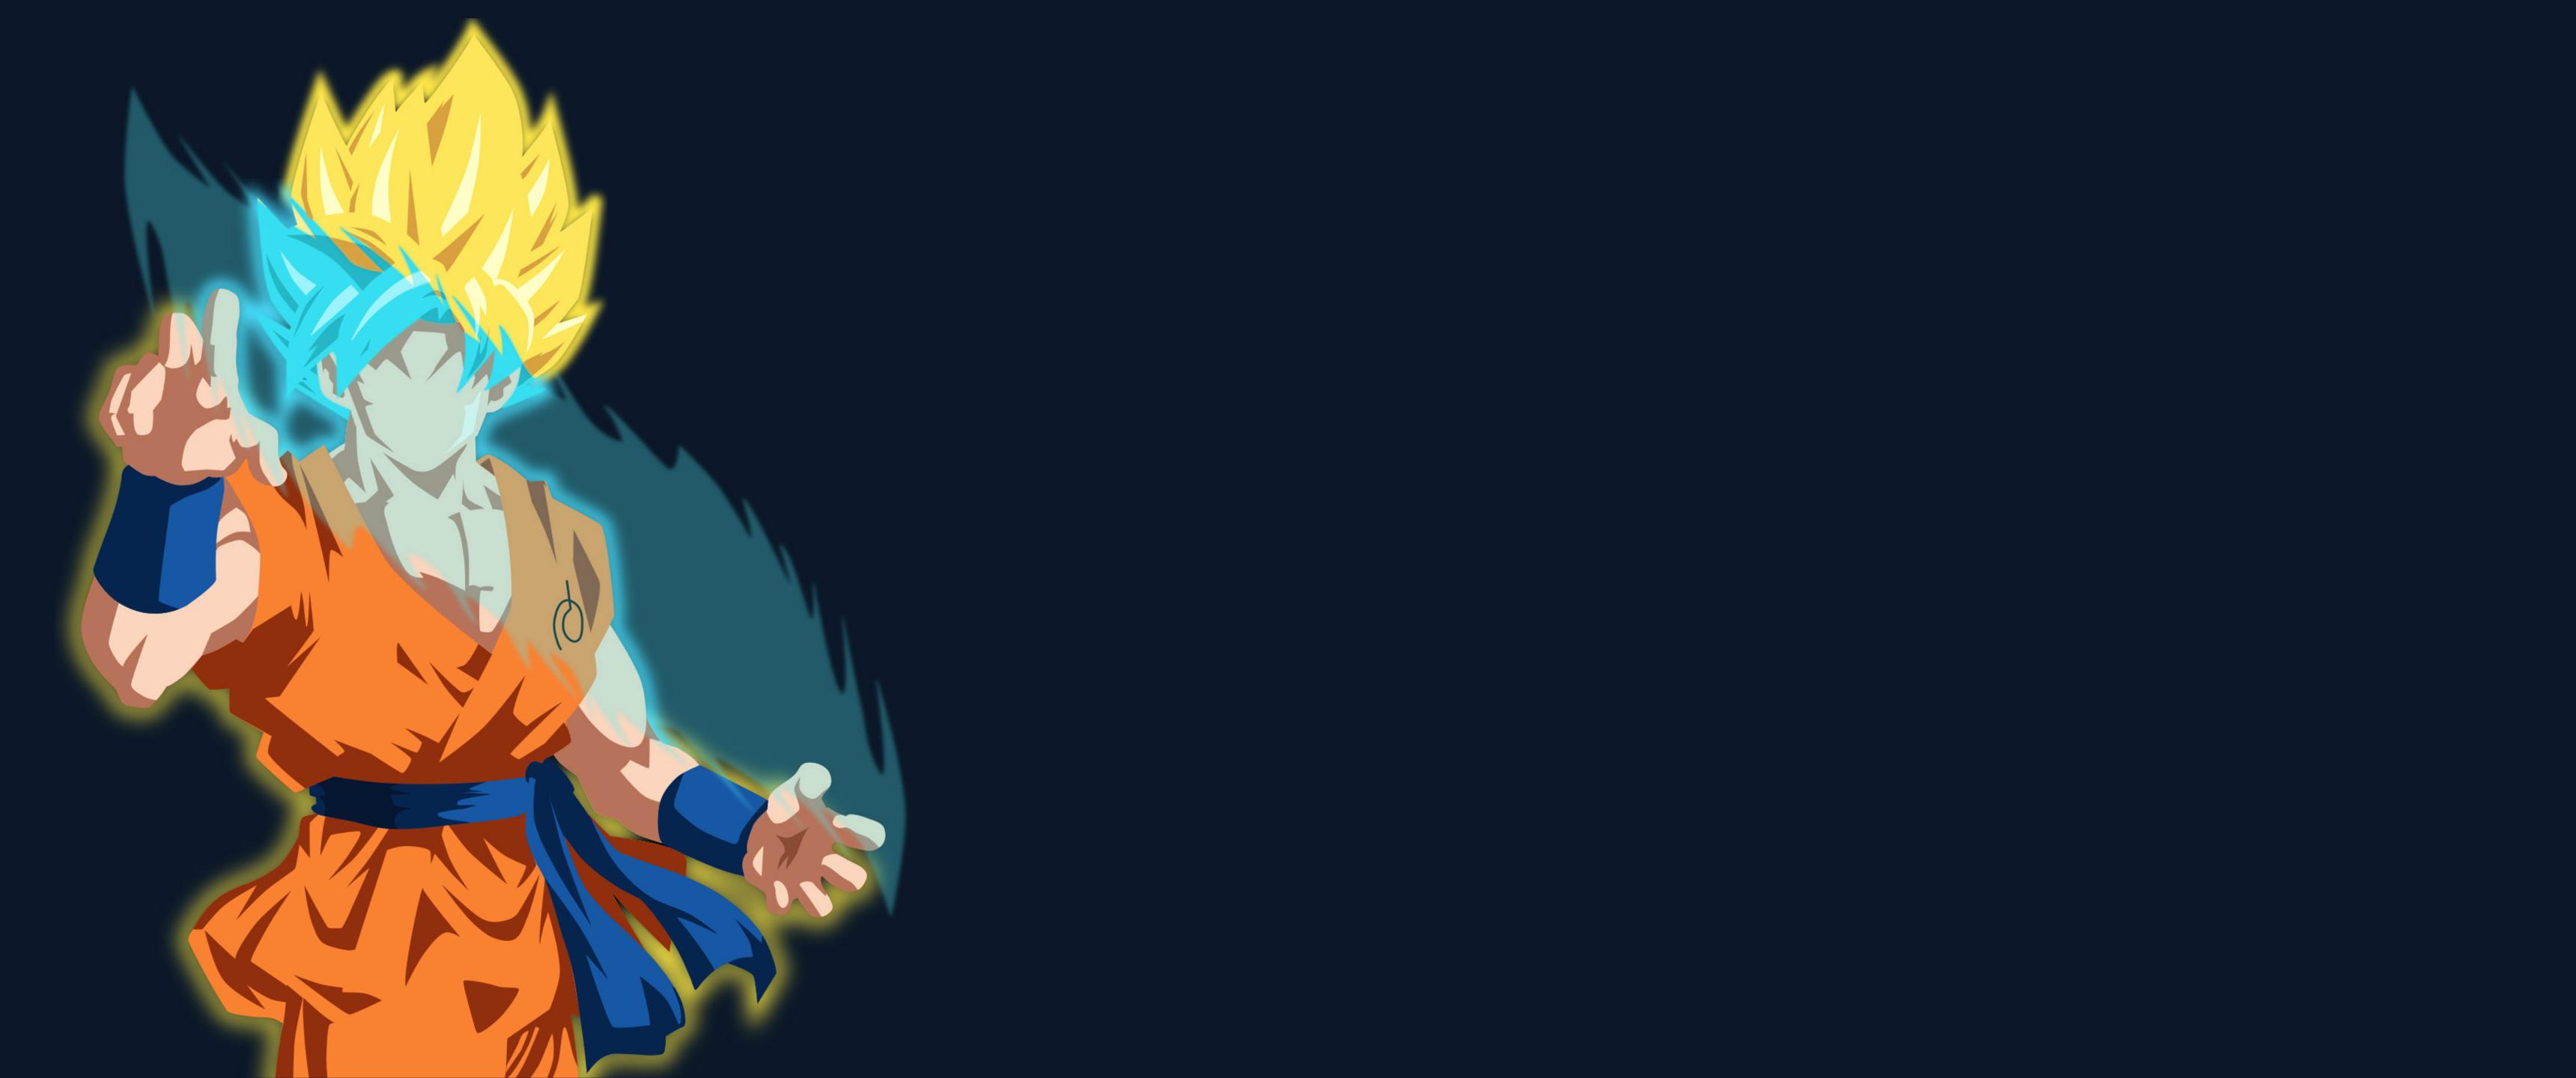 Dragon Ball Super Hd Wallpaper Background Image 3440x1440 Id